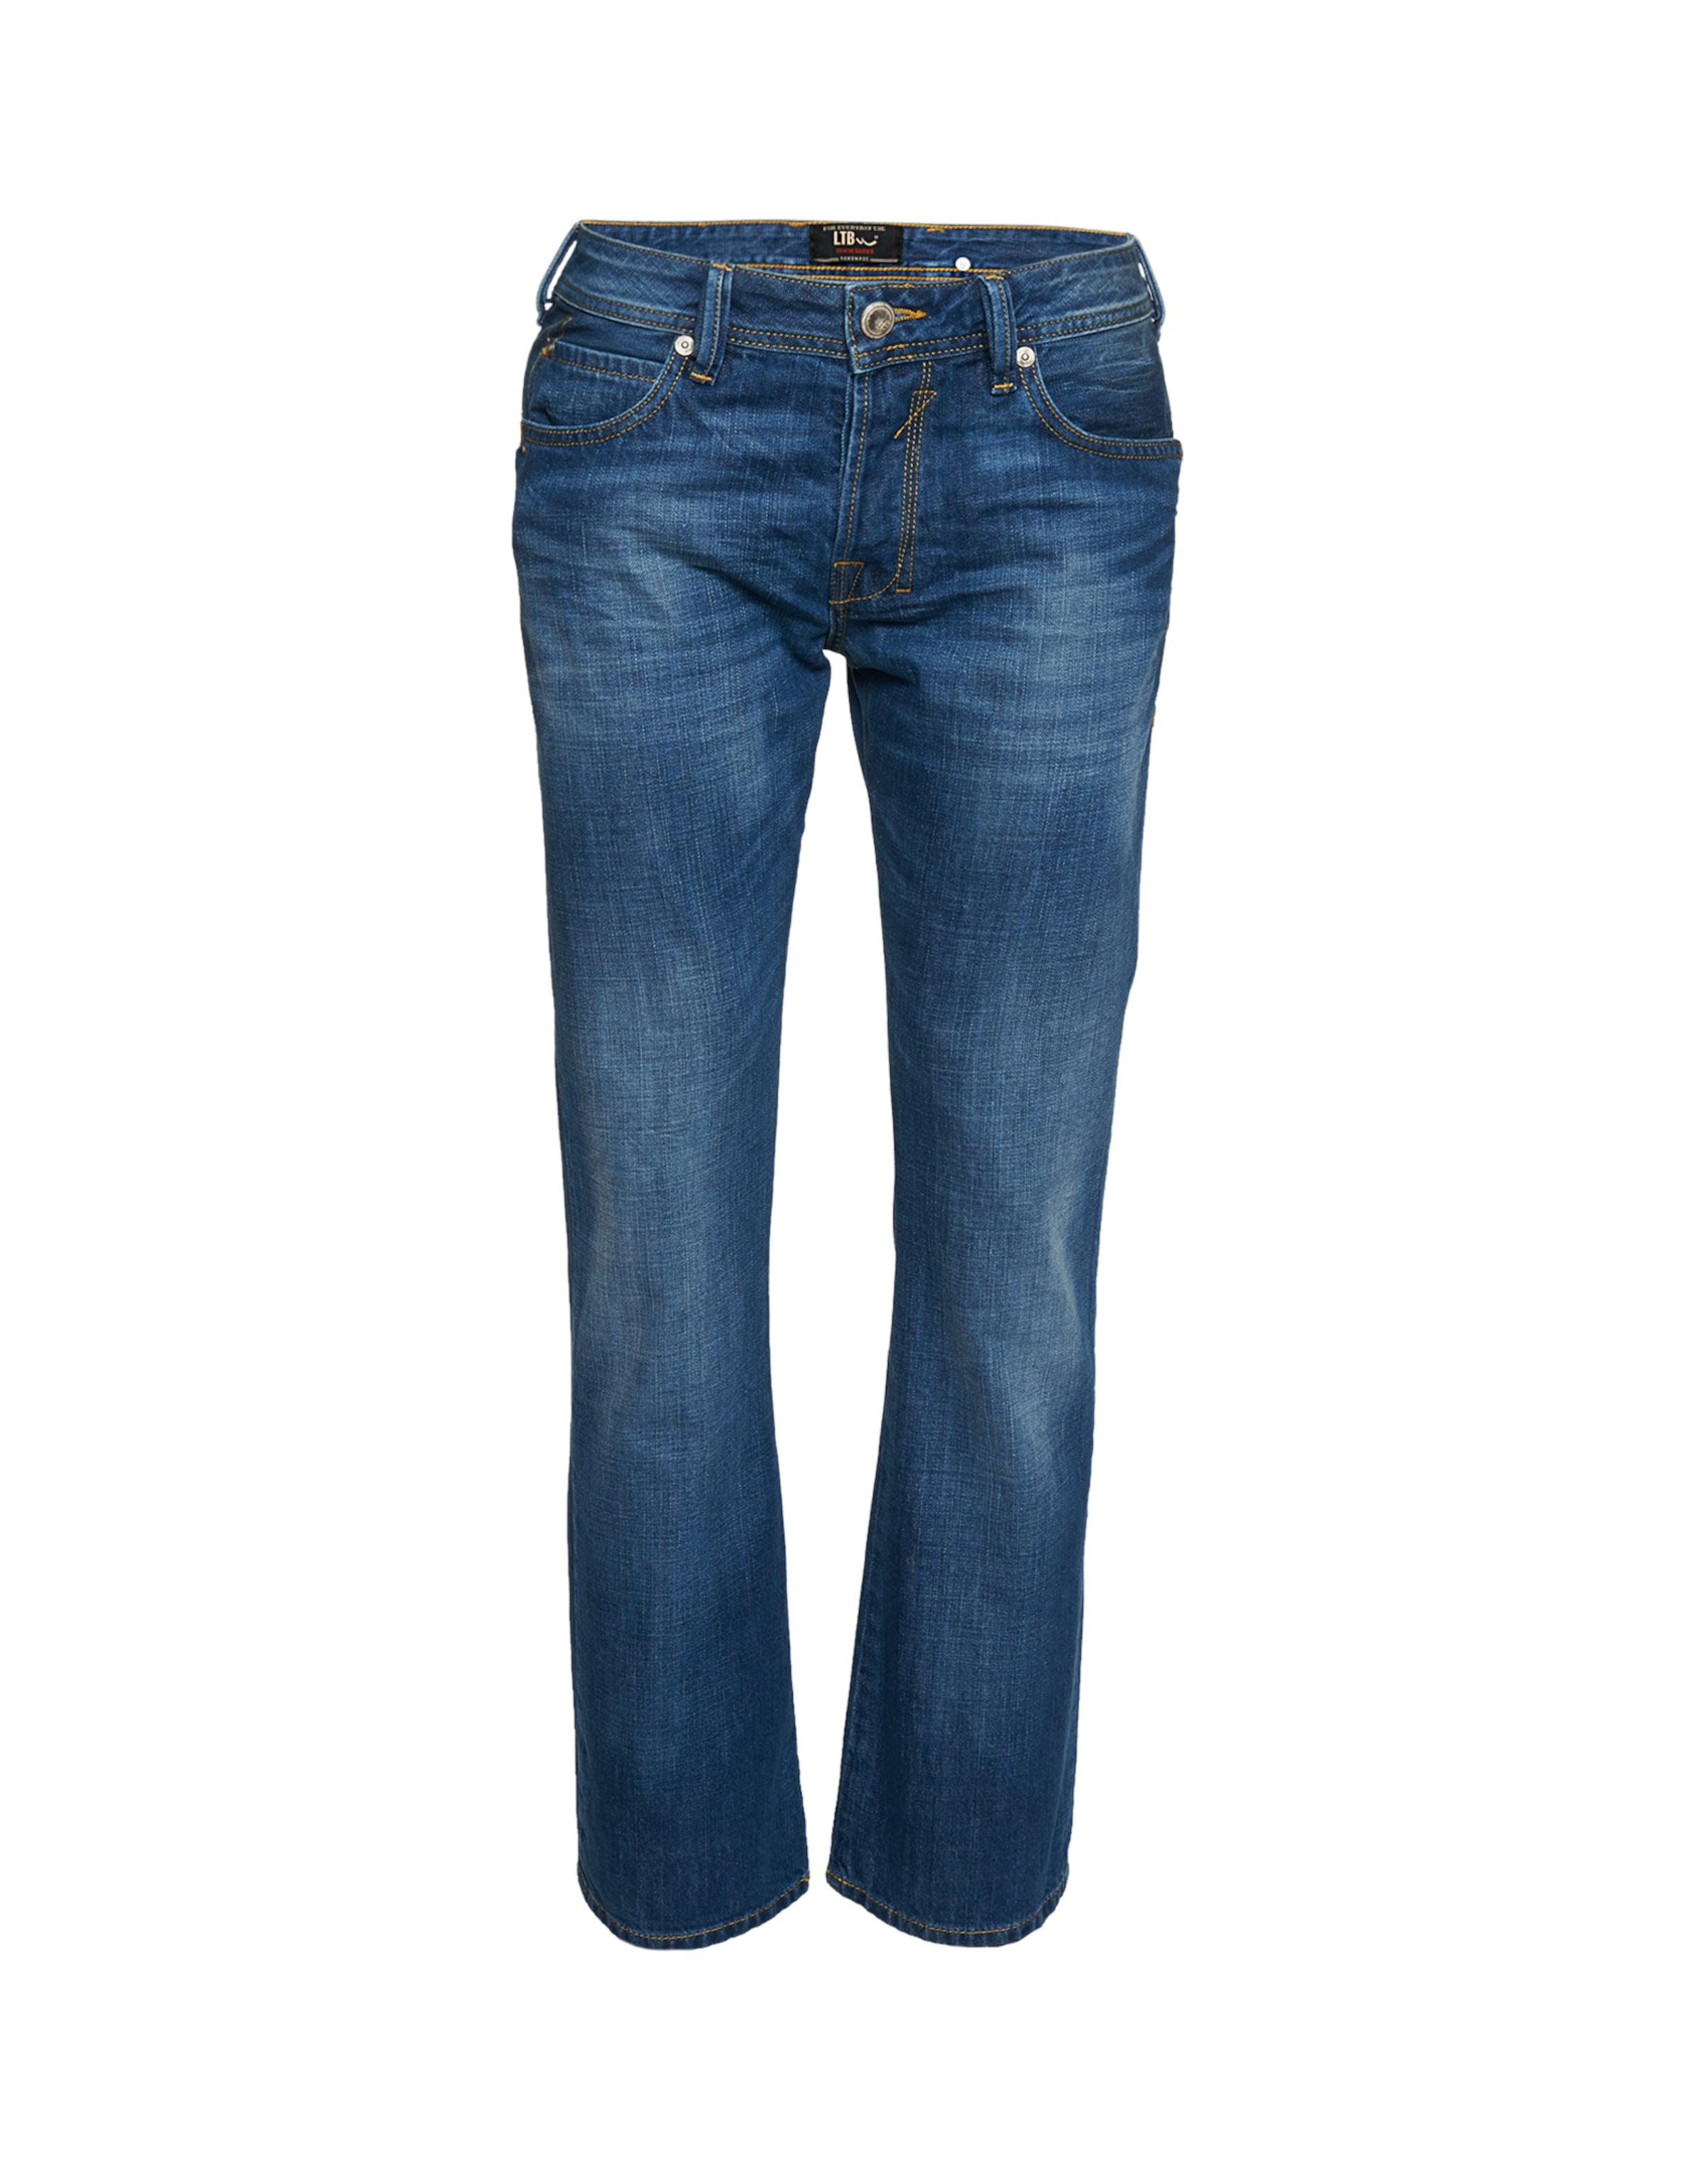 Blau Ltb Jeans Ltb 'roden' In TlK1JcF